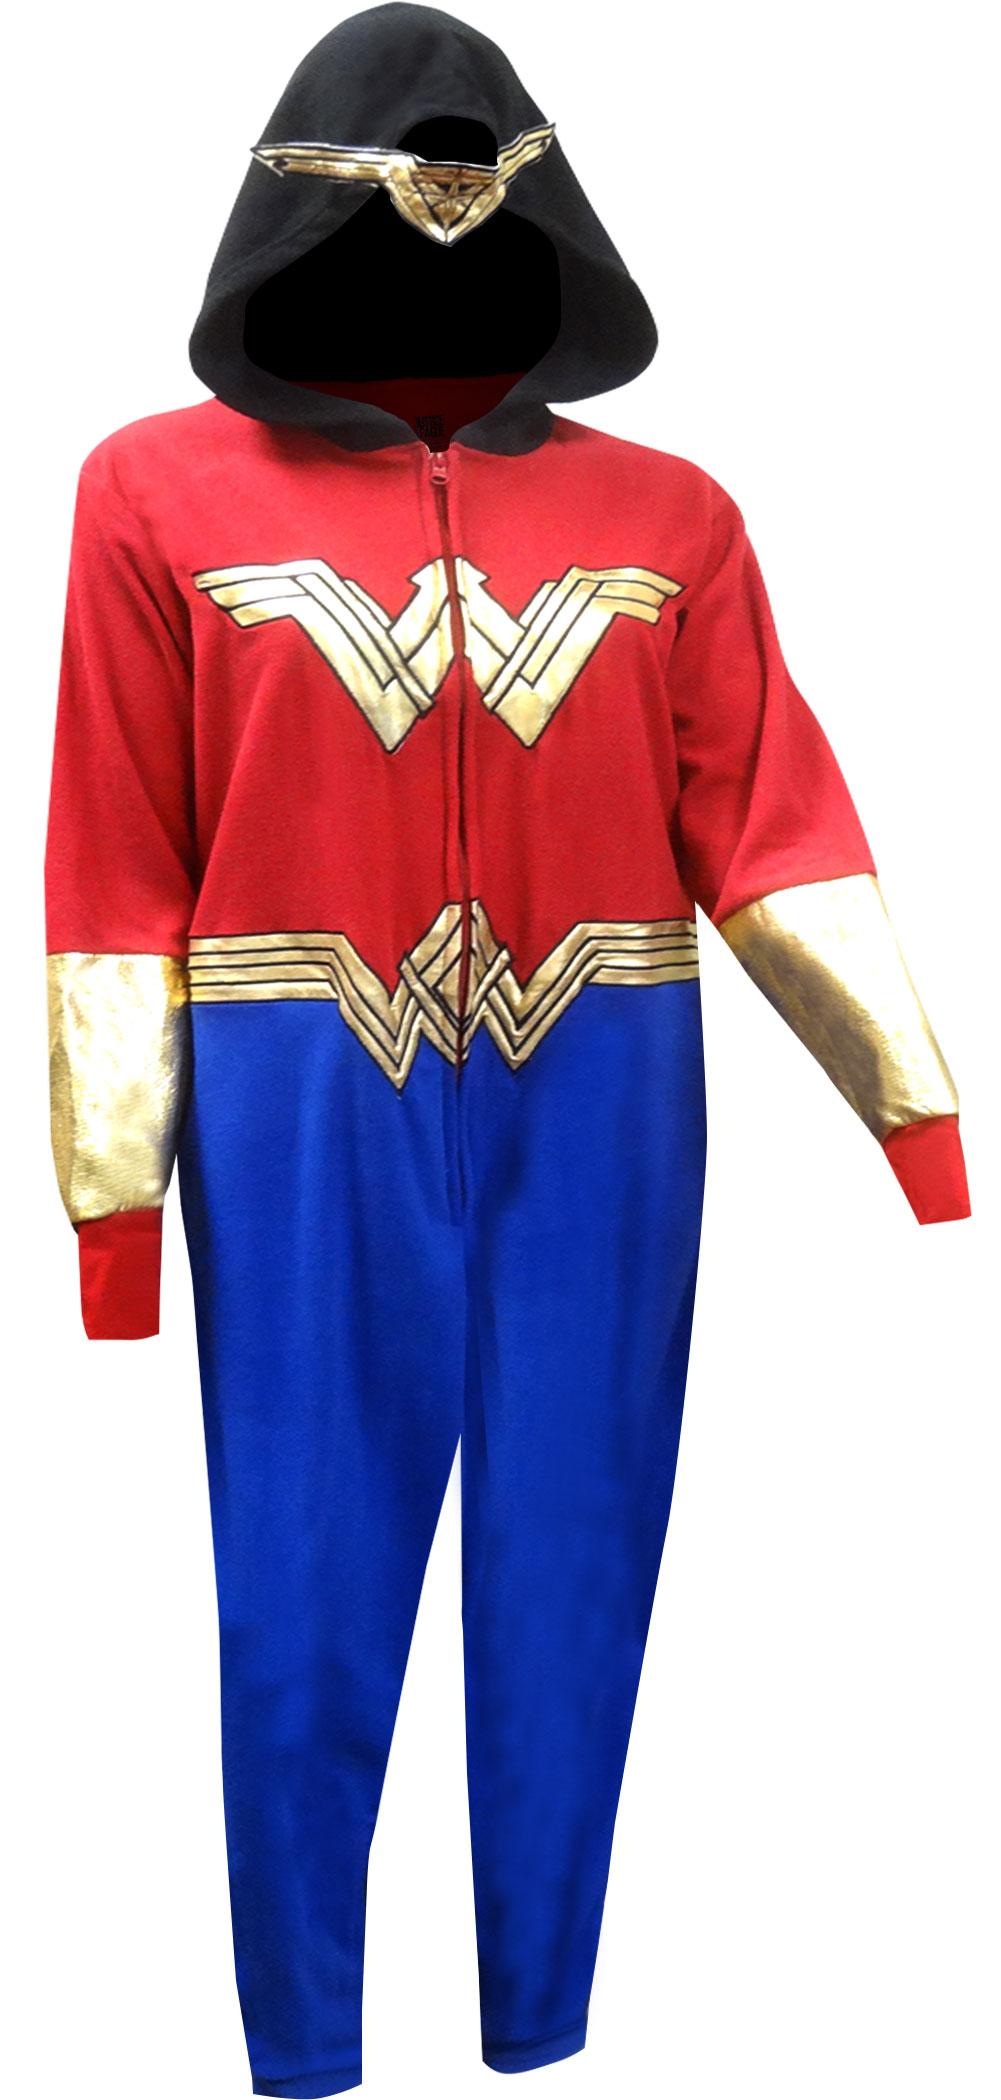 Wonder Woman Golden Accent Onesie Pajama With Drop Seat